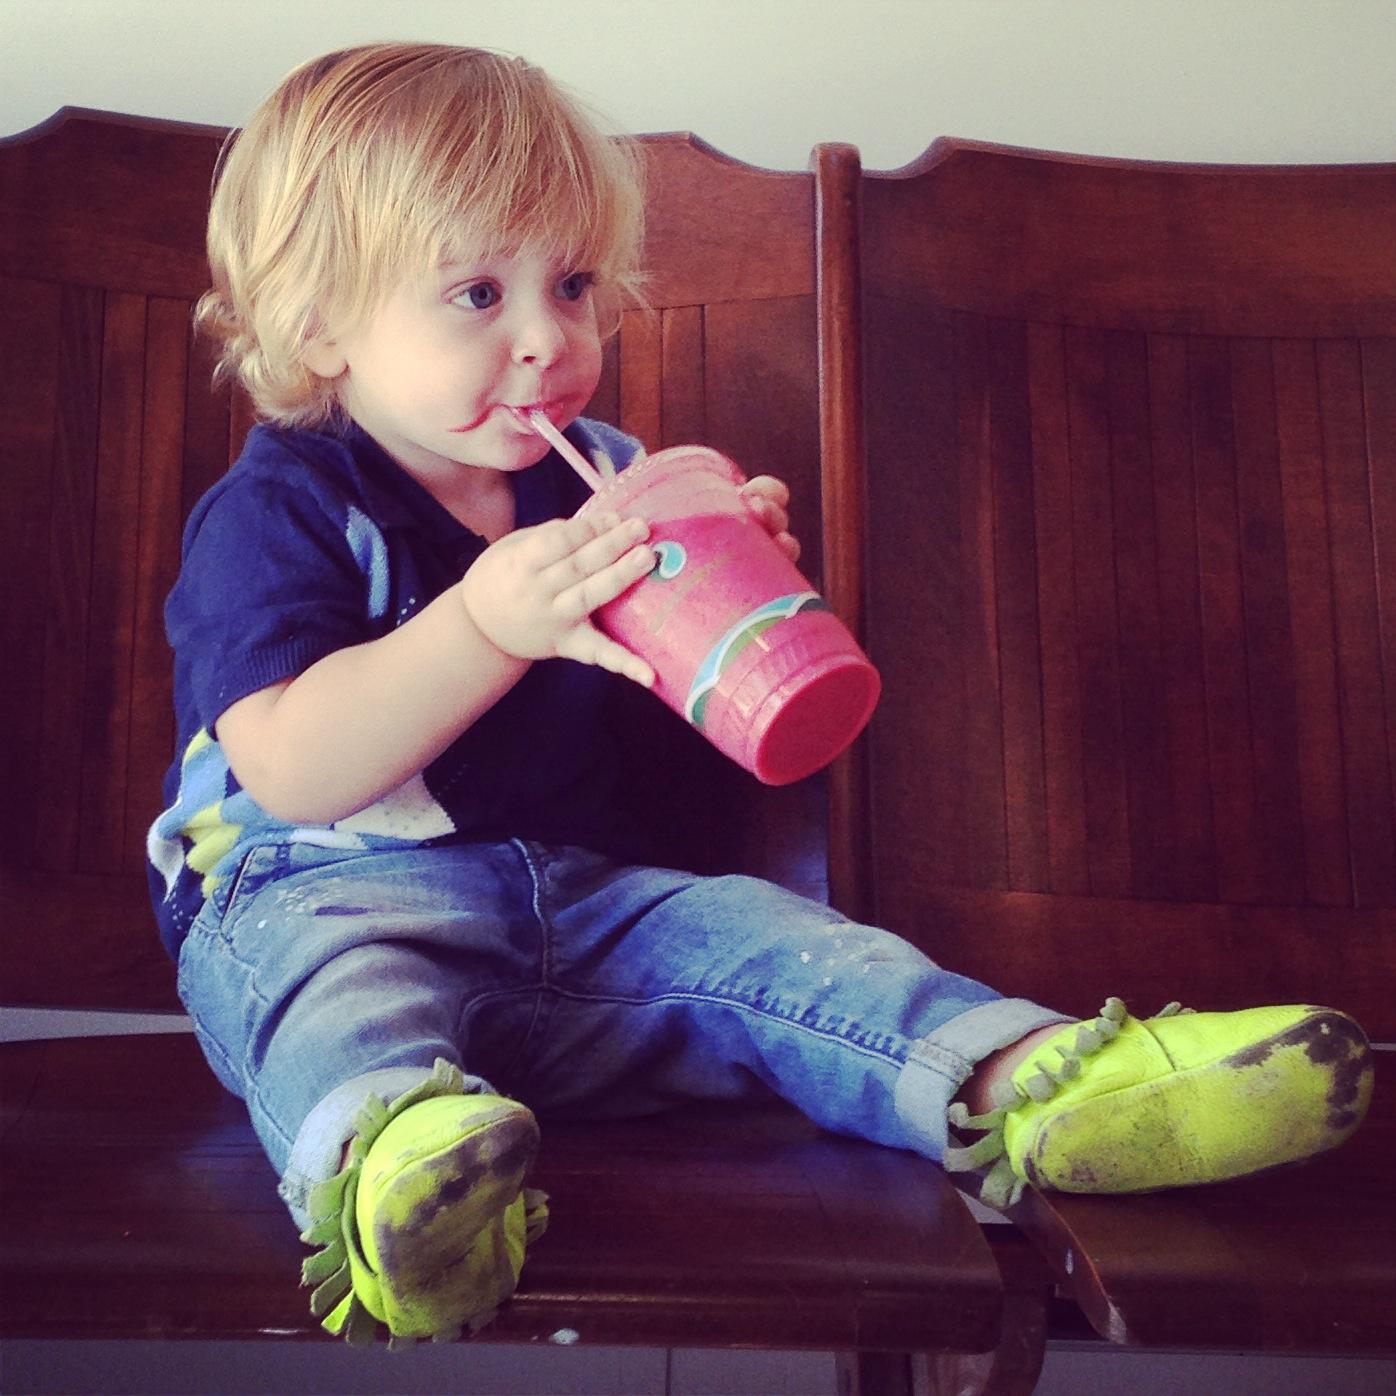 The littlest juicer, Maxim